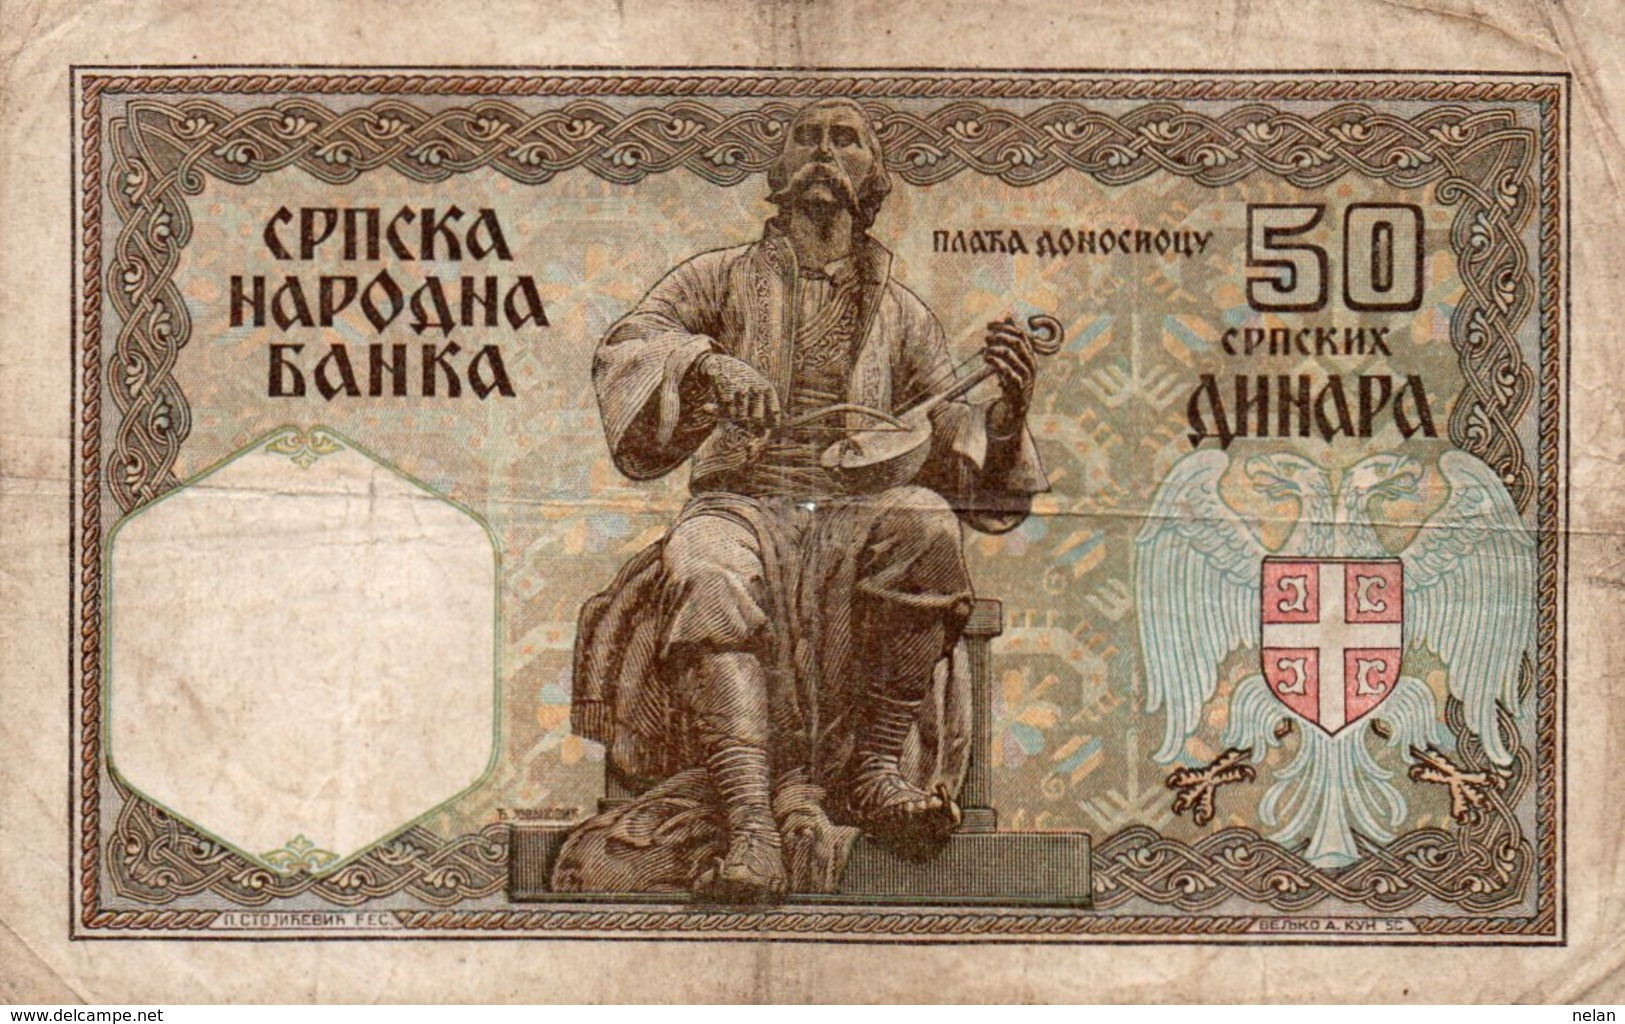 SERBIA 50 DINARA 1941 P-26 - Serbie